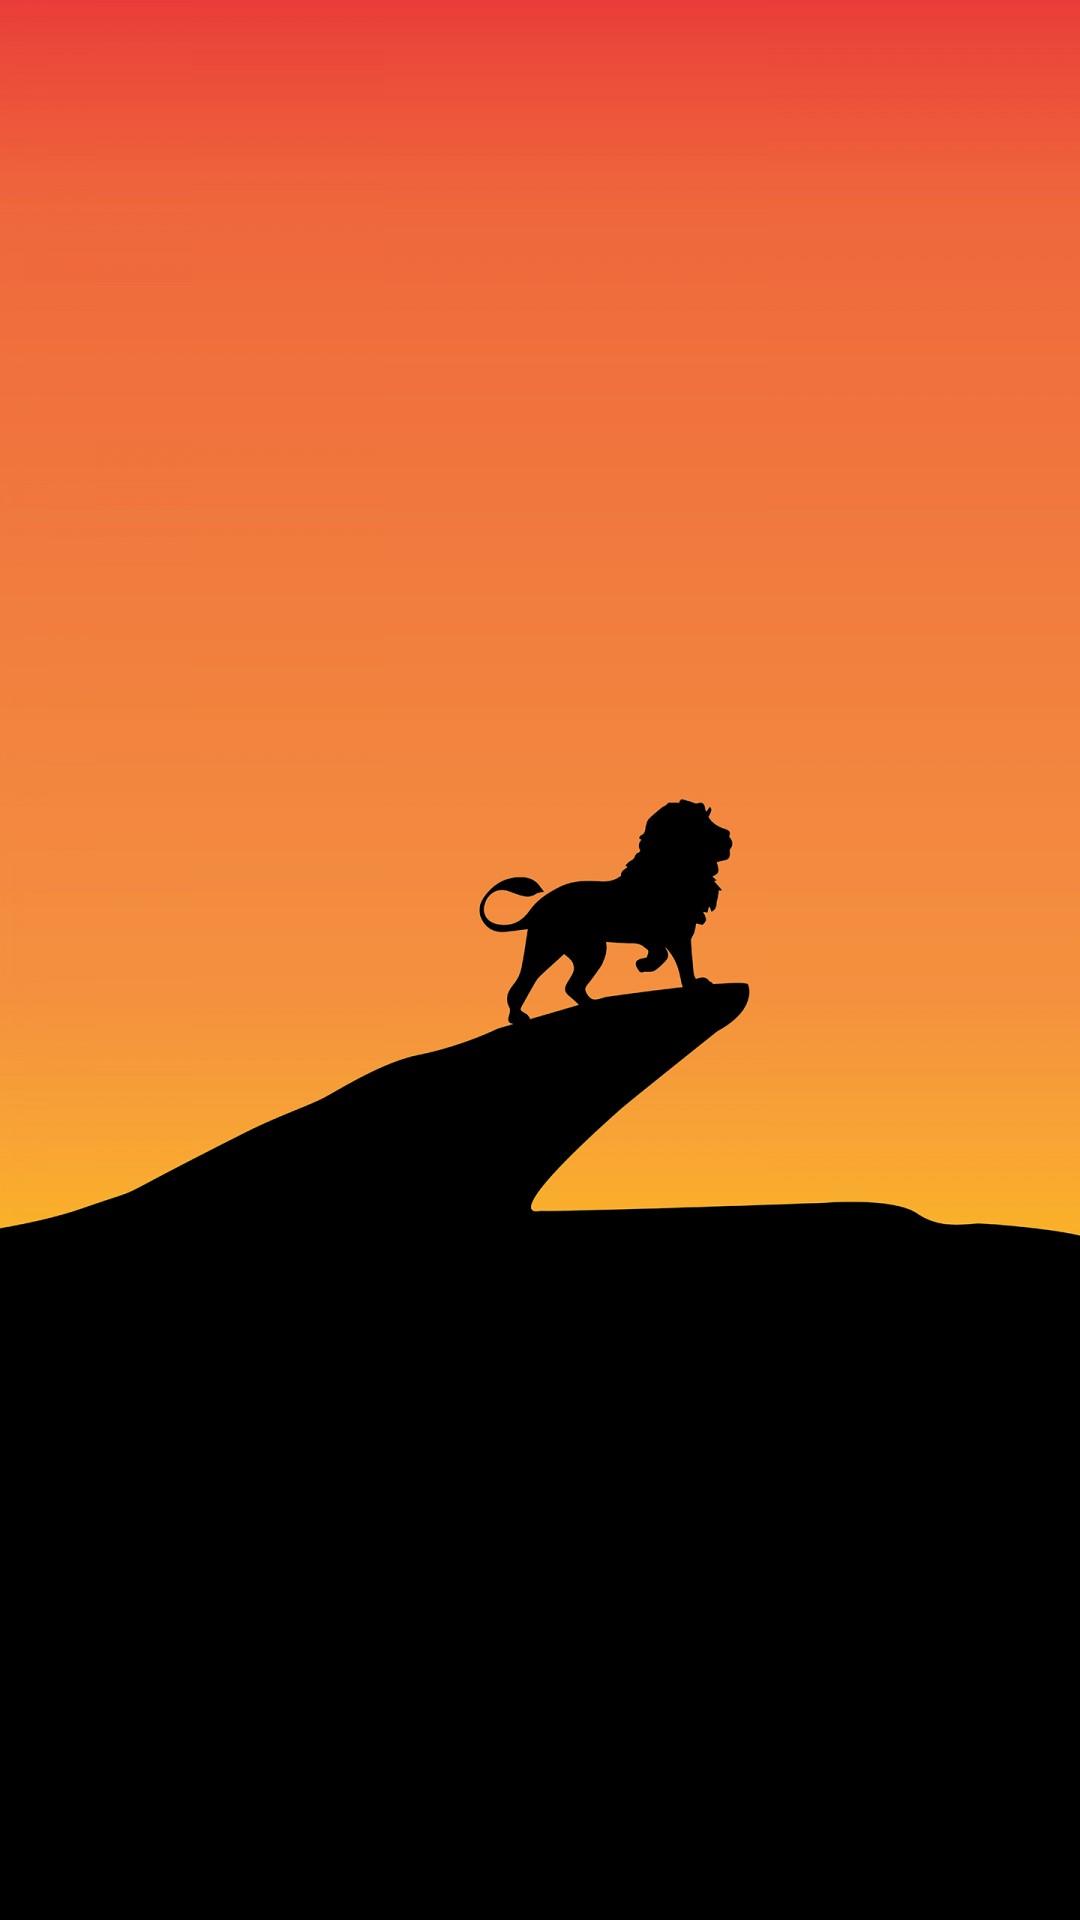 Lion Live Wallpaper Iphone Lion King Silhouette Minimal 4k 8k Wallpapers Hd